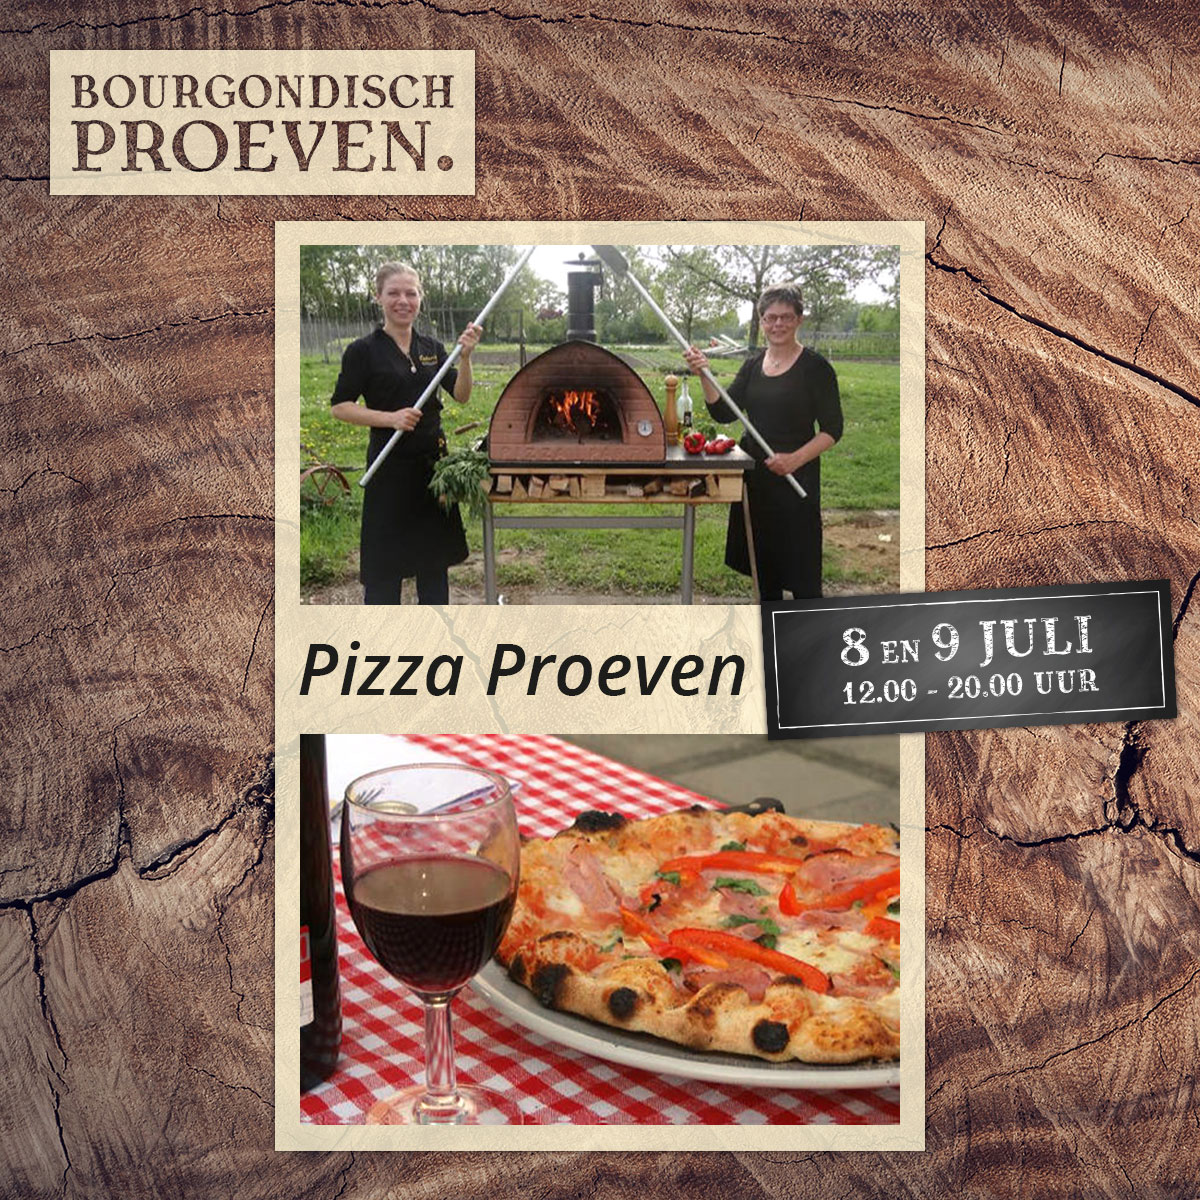 De Bourgondiër – Bourgondisch Proeven. – Facebookbericht – Pizza-Proeven